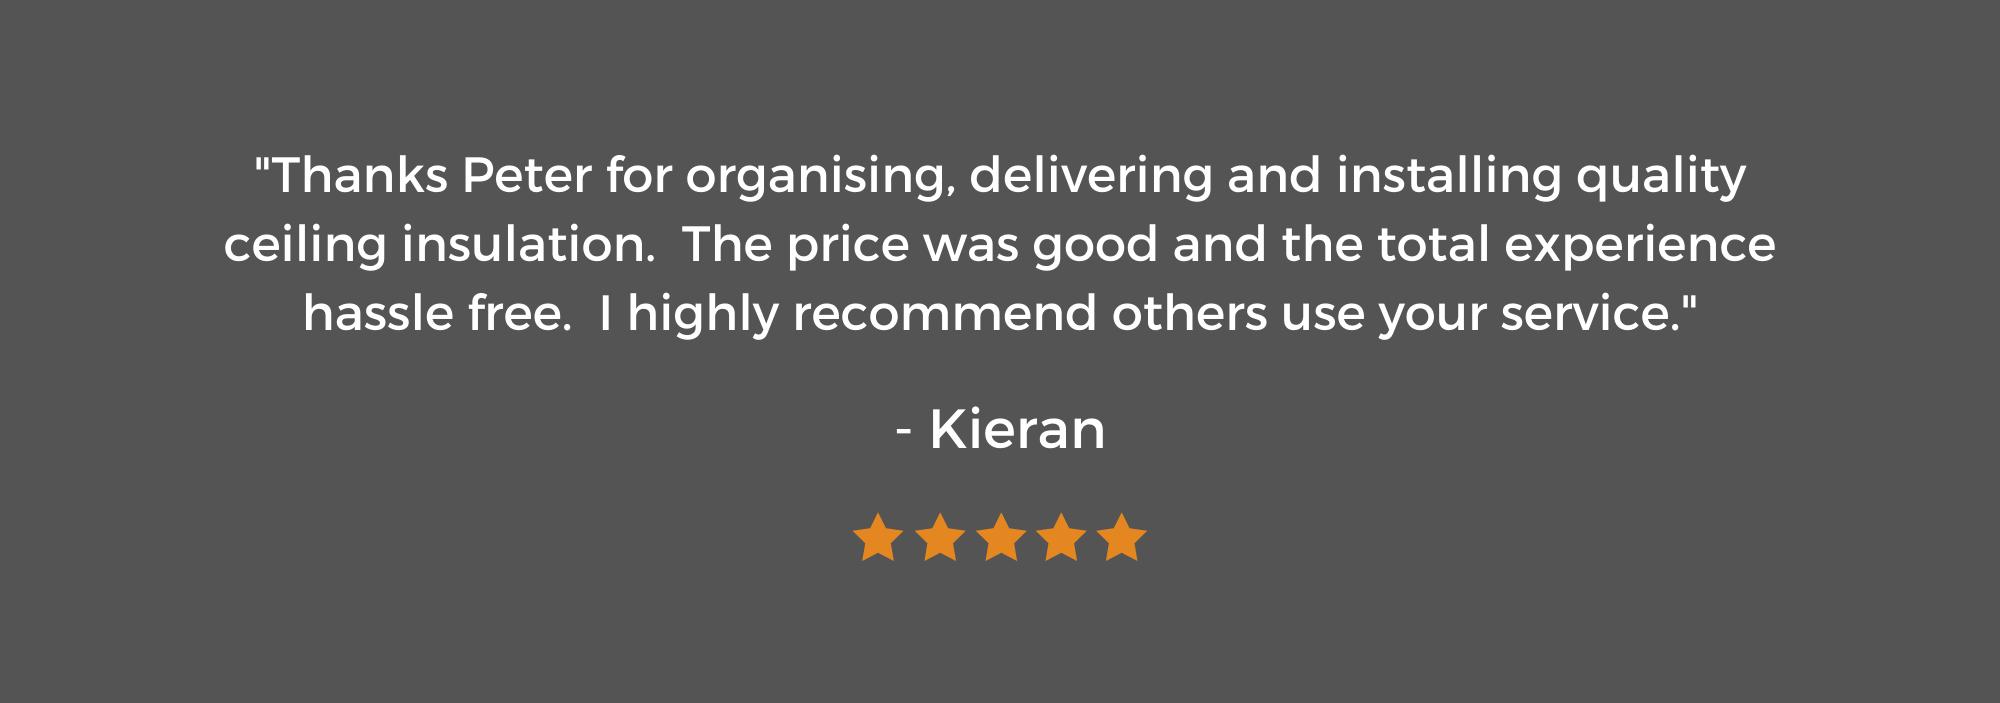 5 Star Review from Kieran